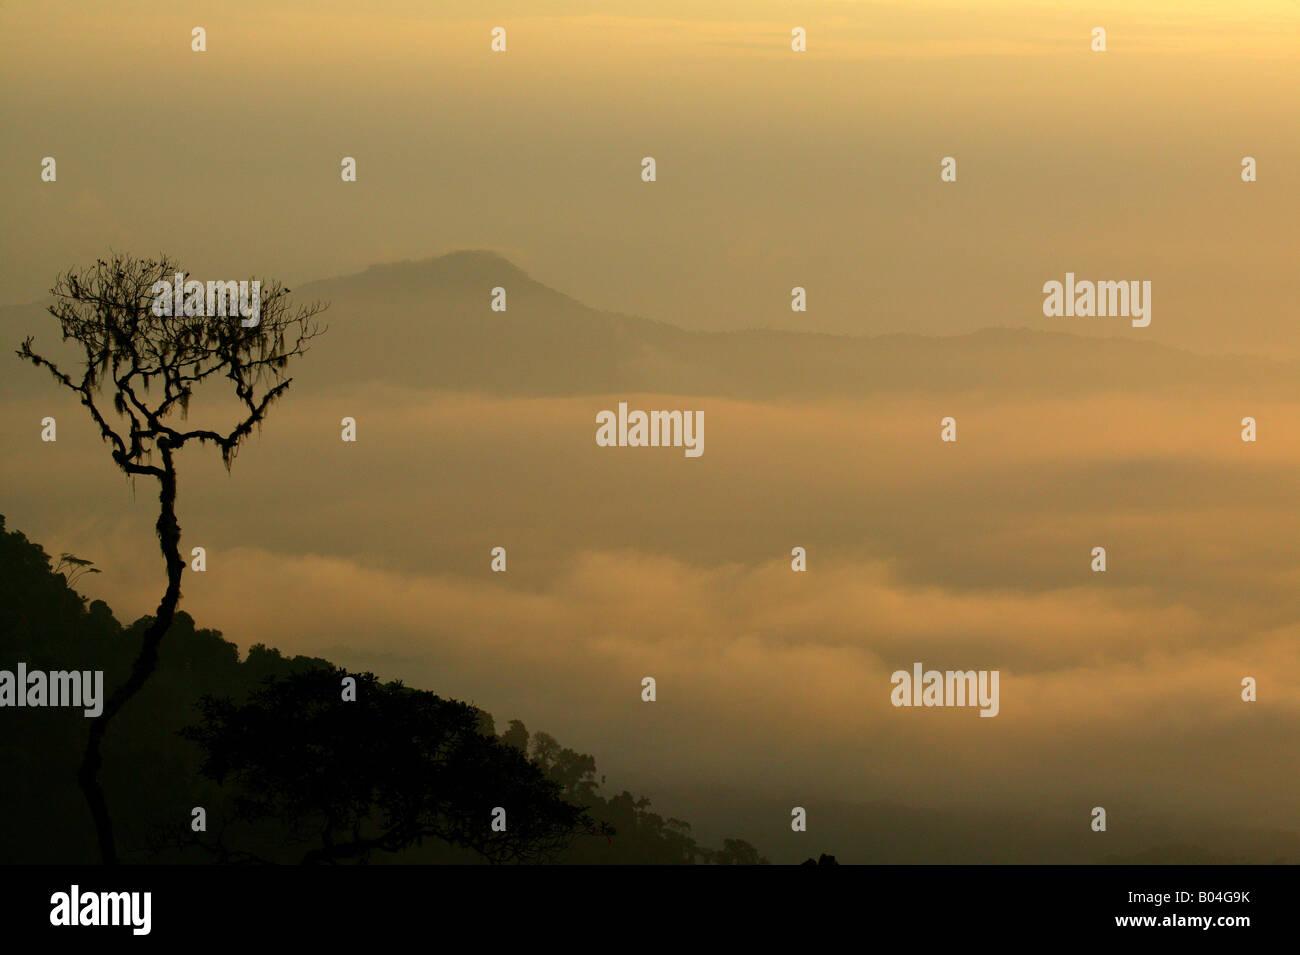 Misty rainforest at sunrise seen from Cerro Pirre in Darien national park, Darien province, Republic of Panama. Stock Photo